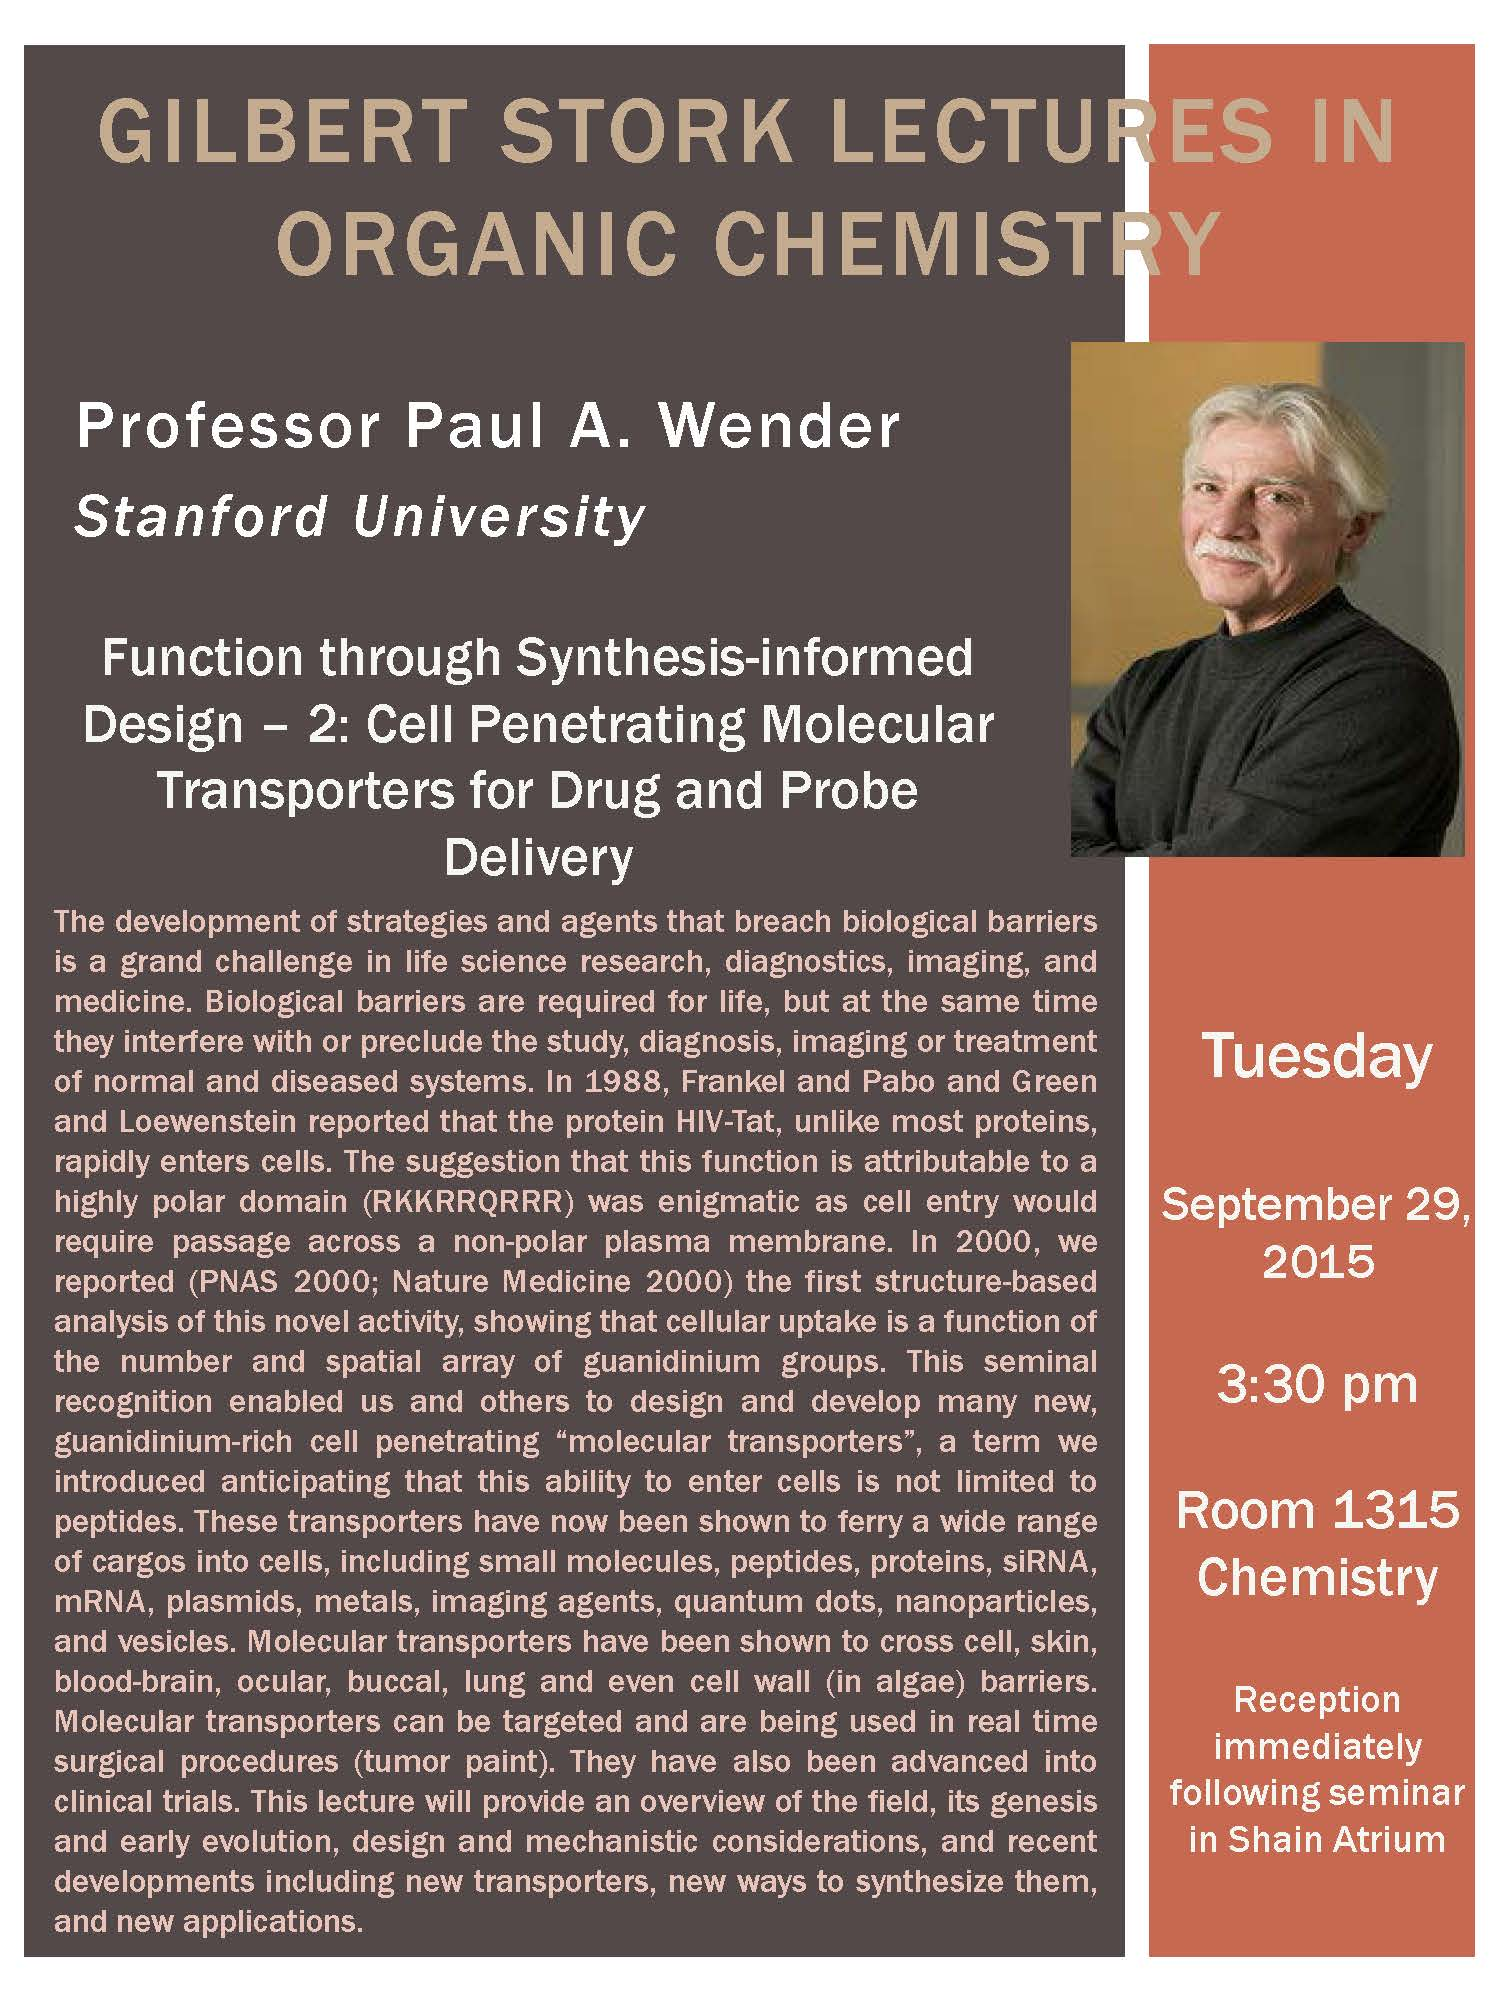 Stanford University | UW-Madison Department of Chemistry